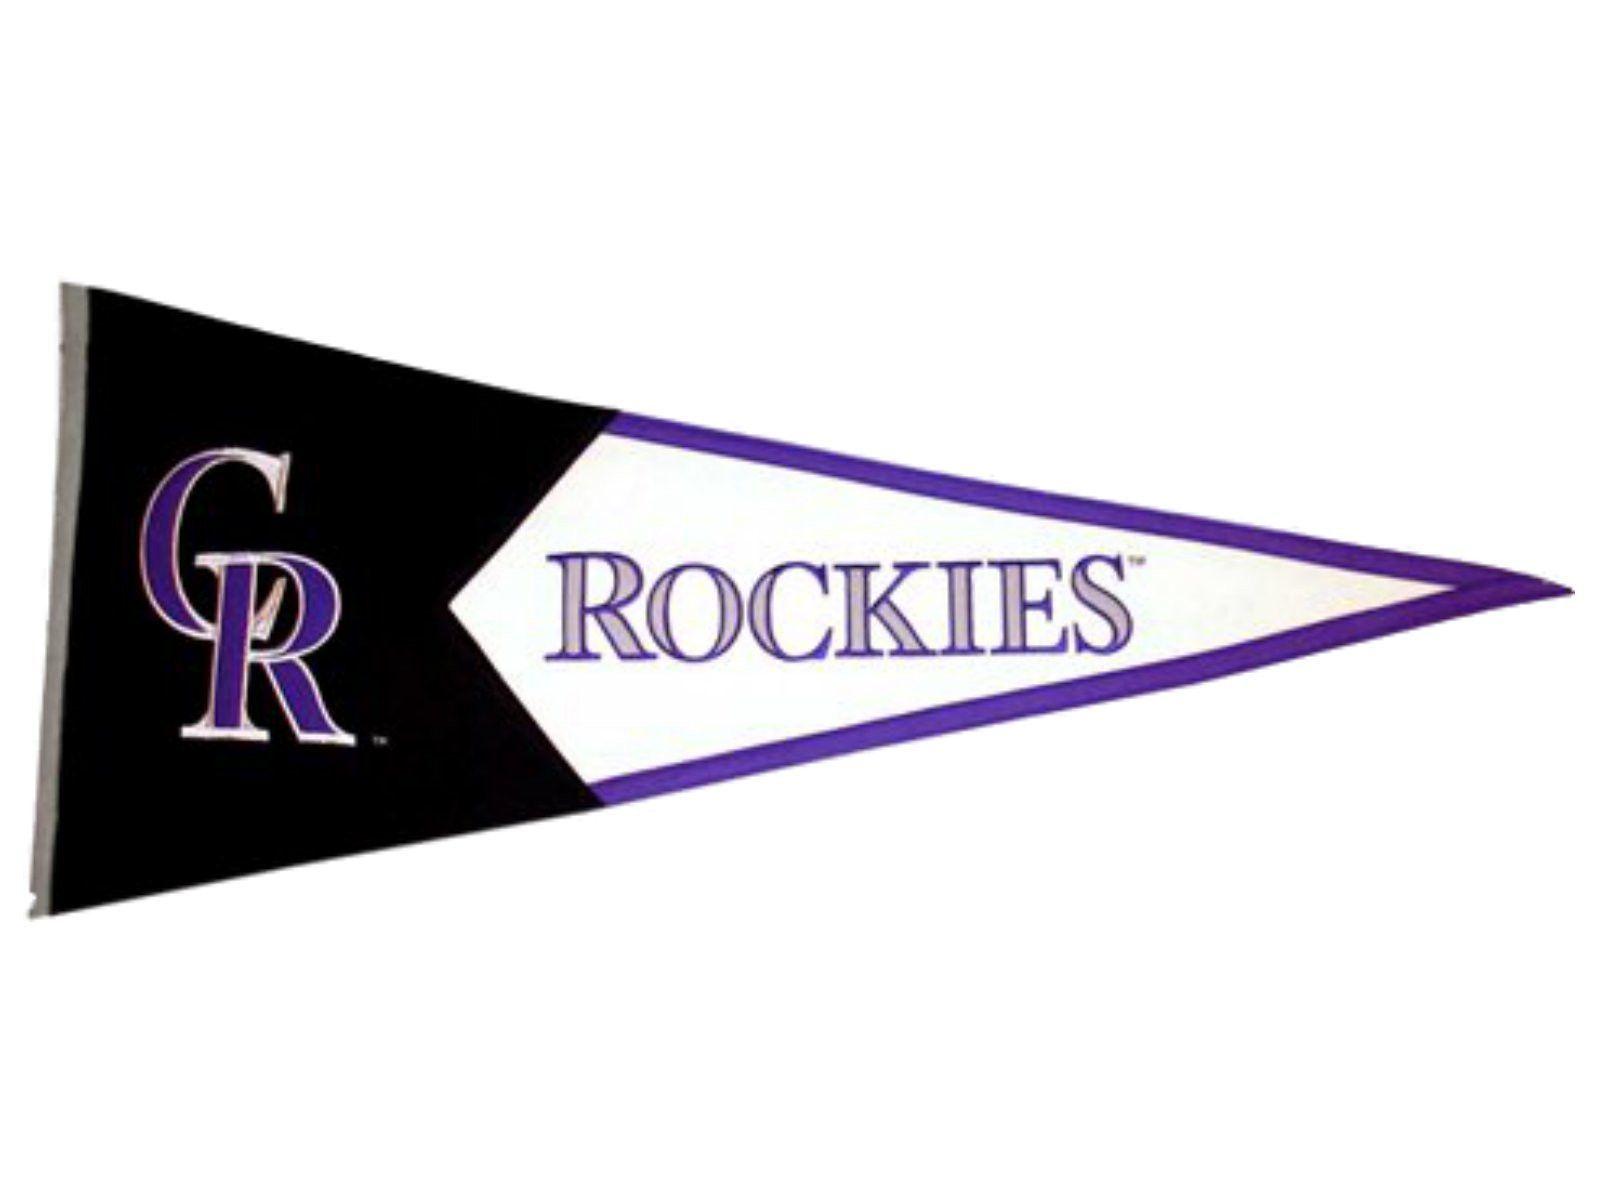 Colorado Rockies Mlb Classic Winning Streak Pennant 17 5 X 40 5 Colorado Rockies Colorado Rockies Baseball Rockies Baseball